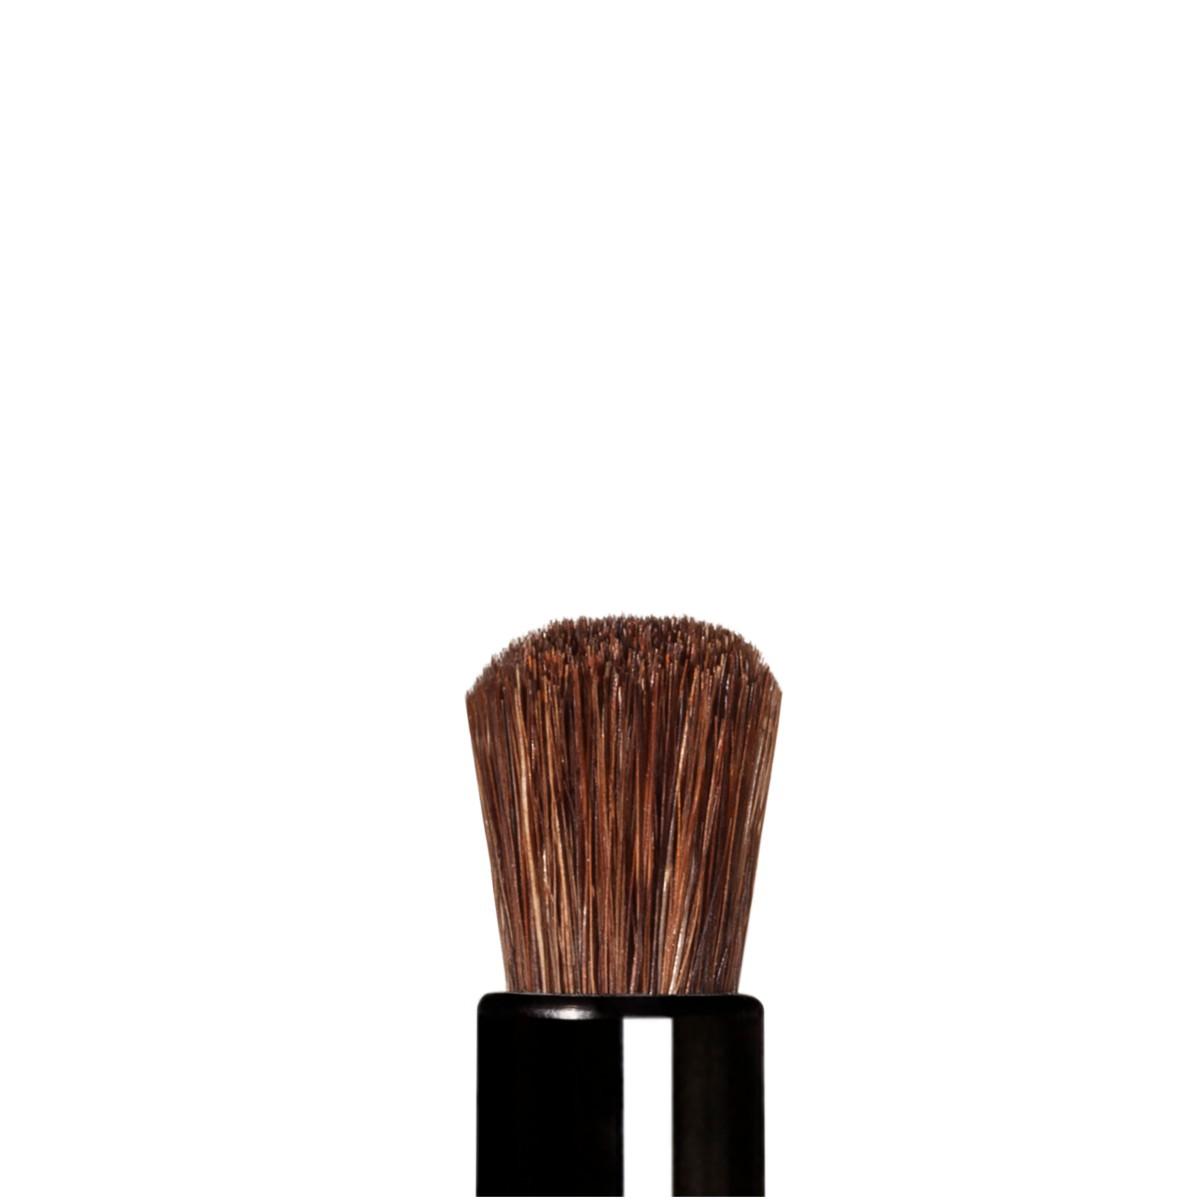 Beauty - Tape à L'oeil - Christian Louboutin